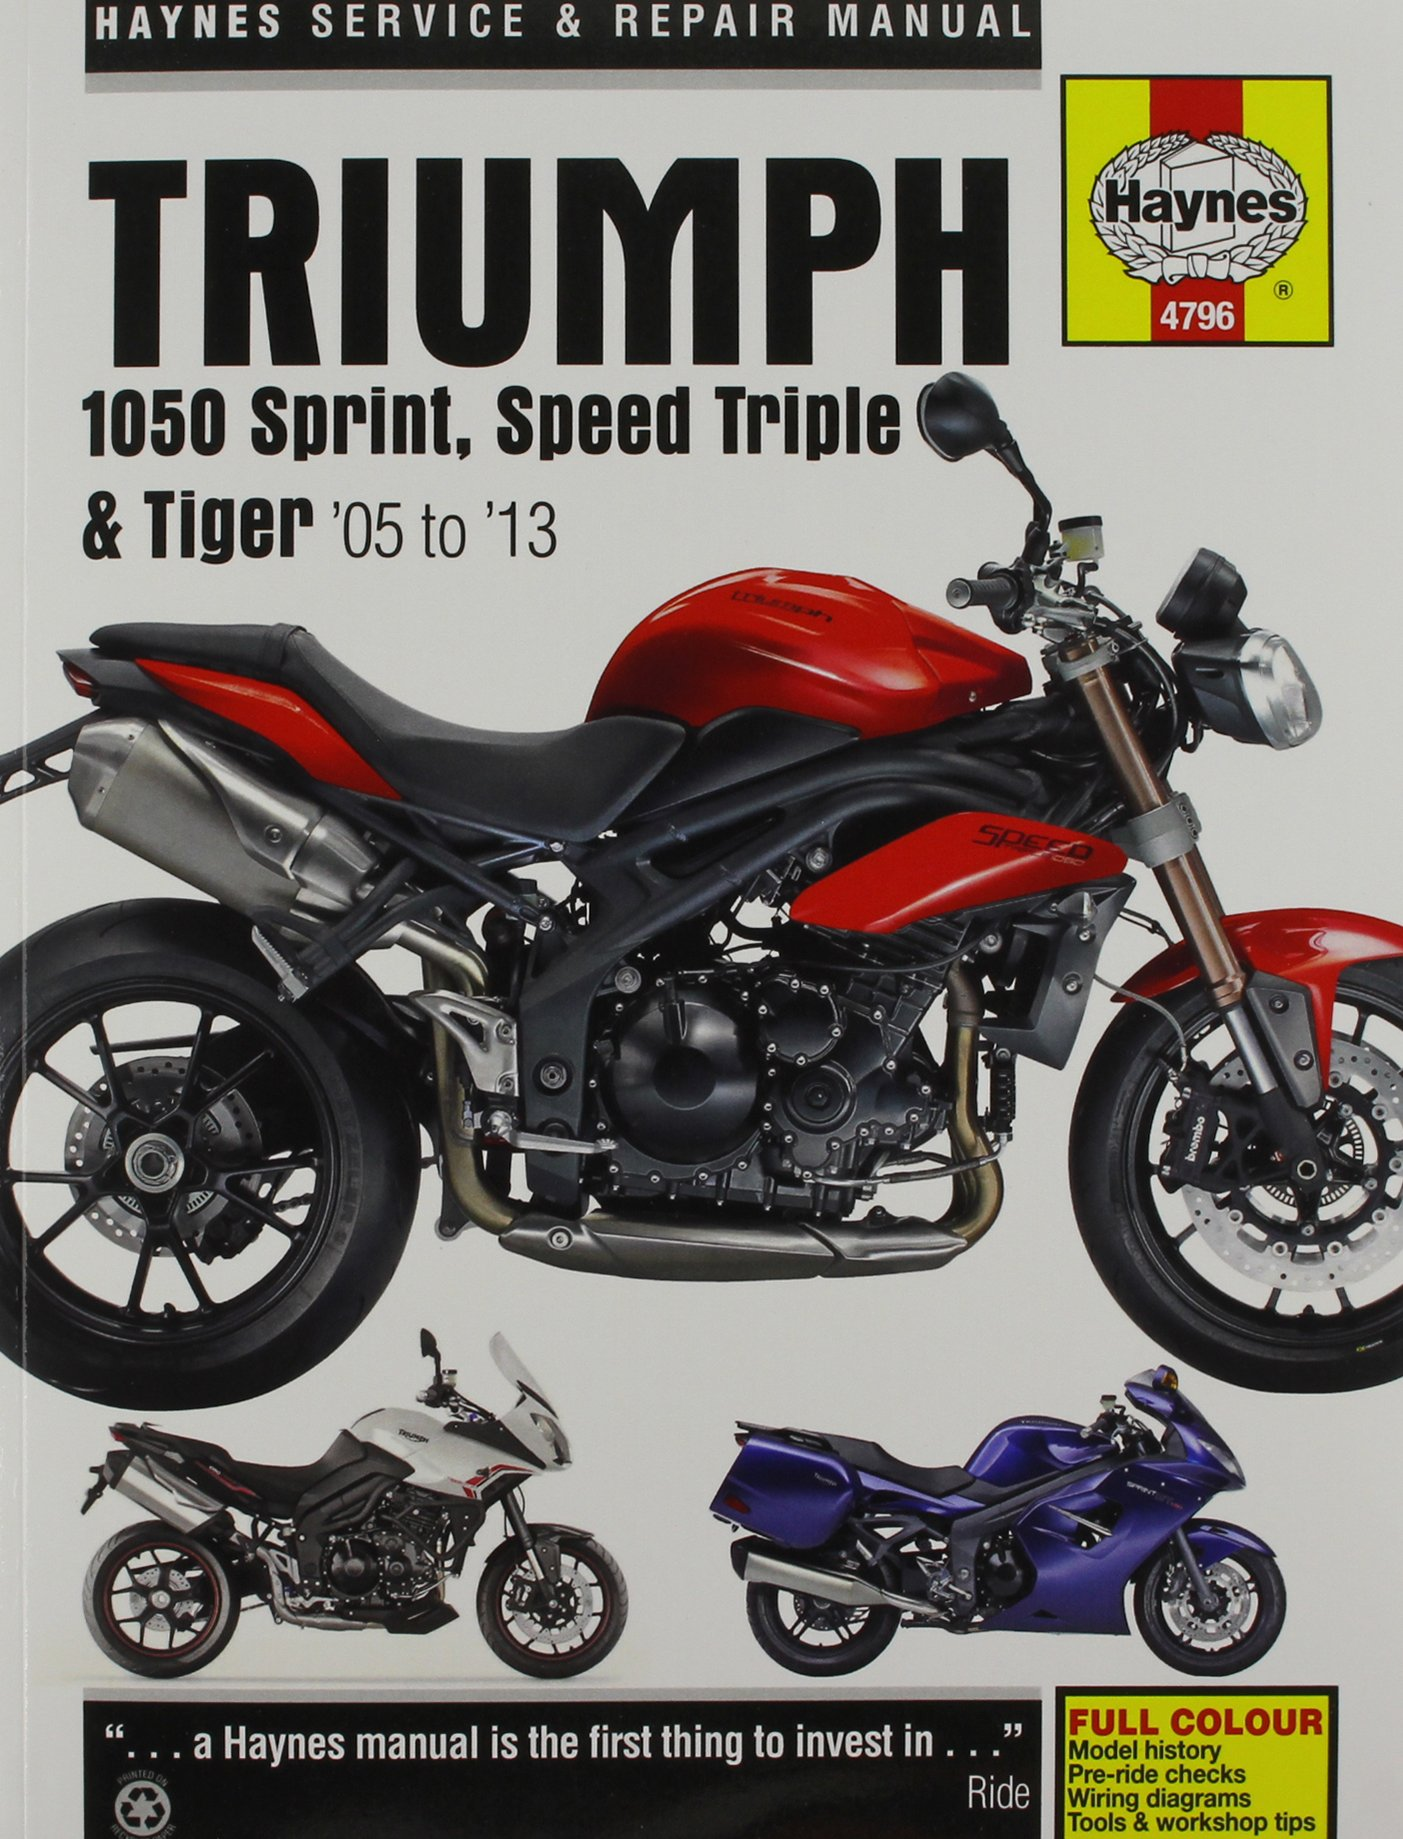 Triumph 1050 Sprint St Speed Triple Tiger 2005 2013 Haynes Wiring Diagram Powersport Anon 9780857338761 Books